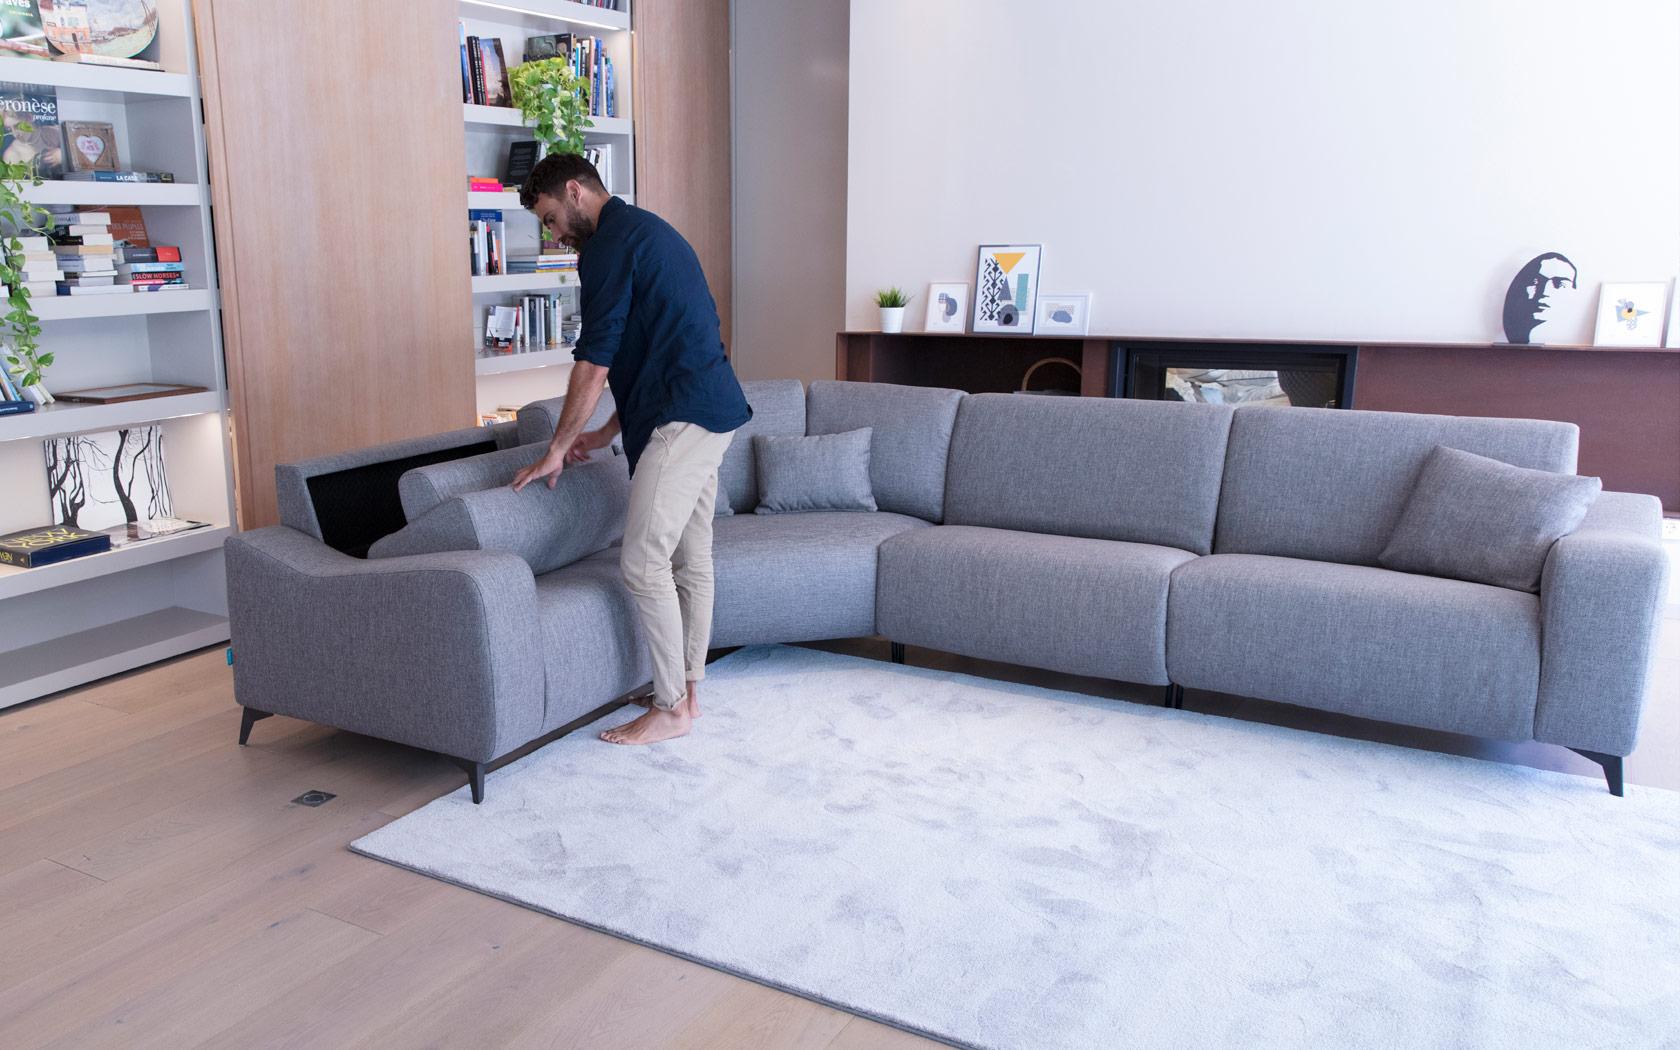 Atlanta sofa relax 2020 12